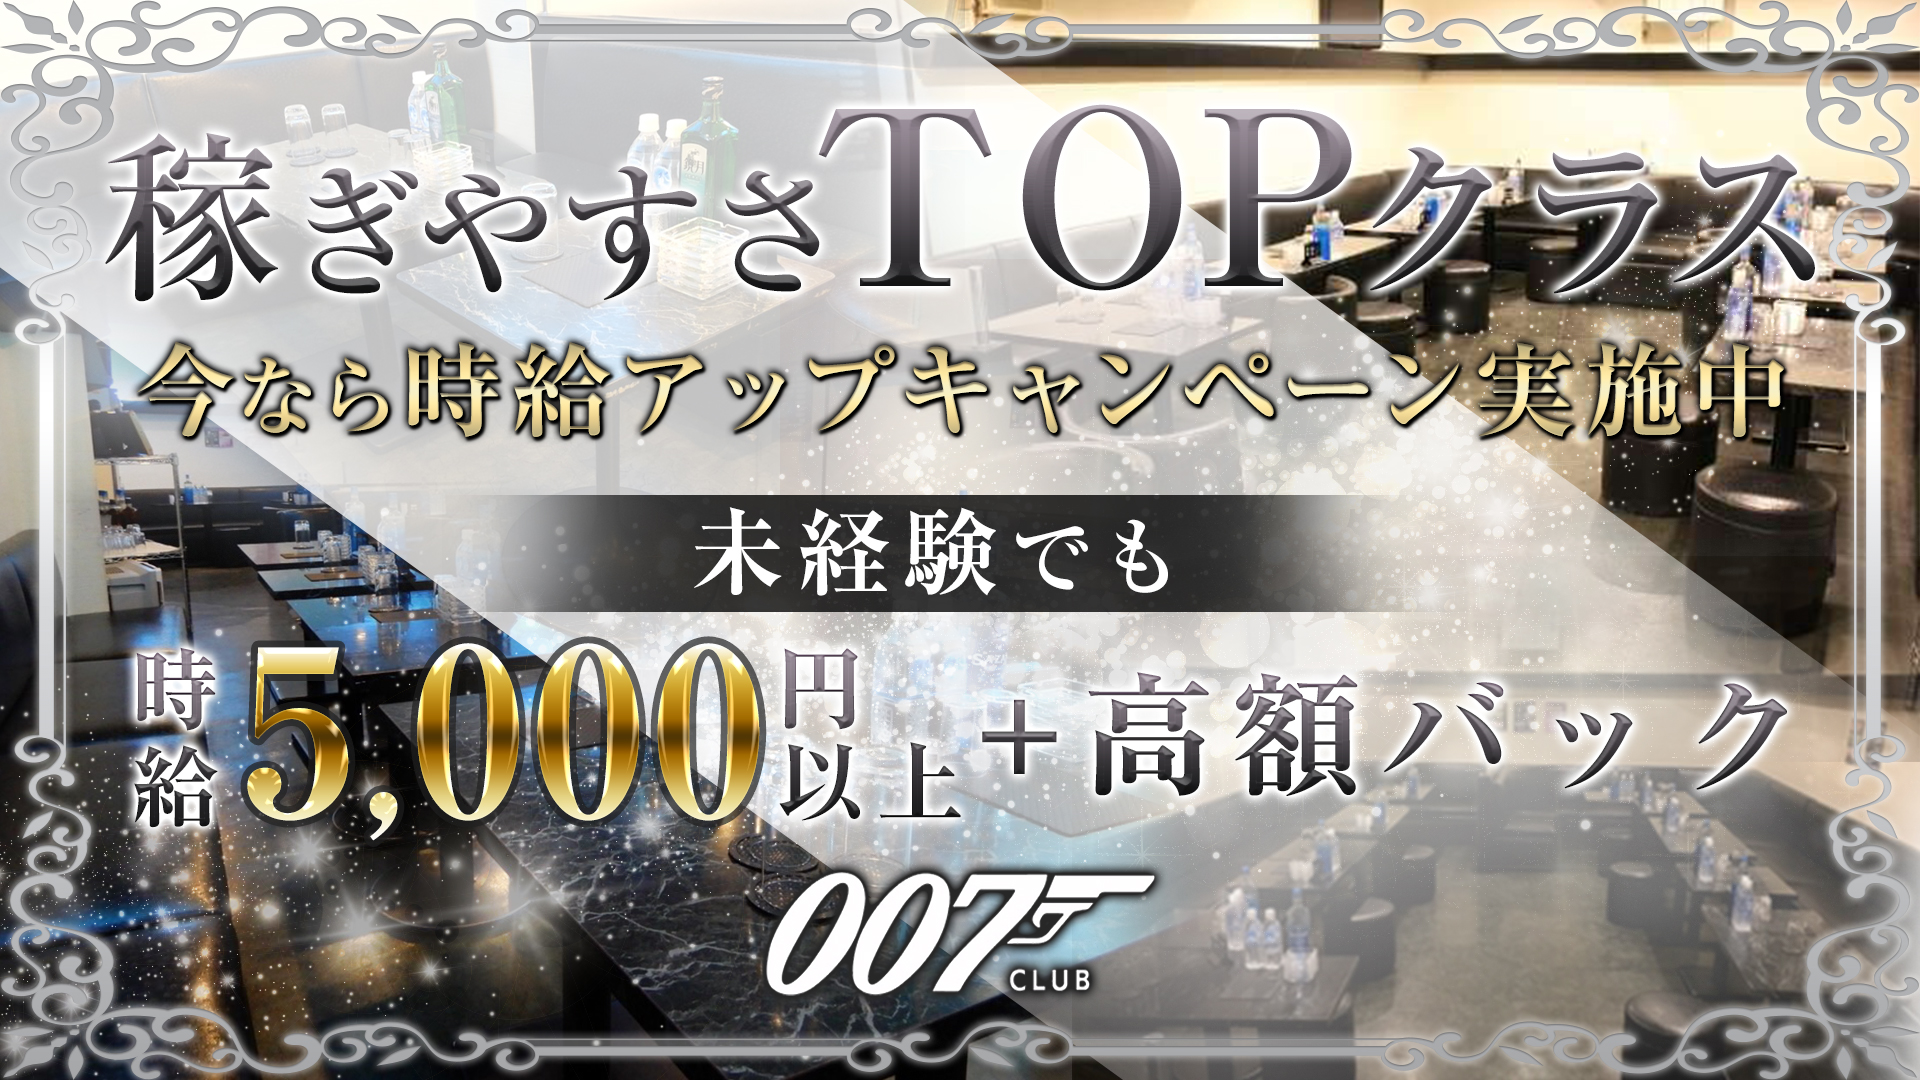 CLUB 007[ダブルオーセブン] 錦糸町 キャバクラ TOP画像